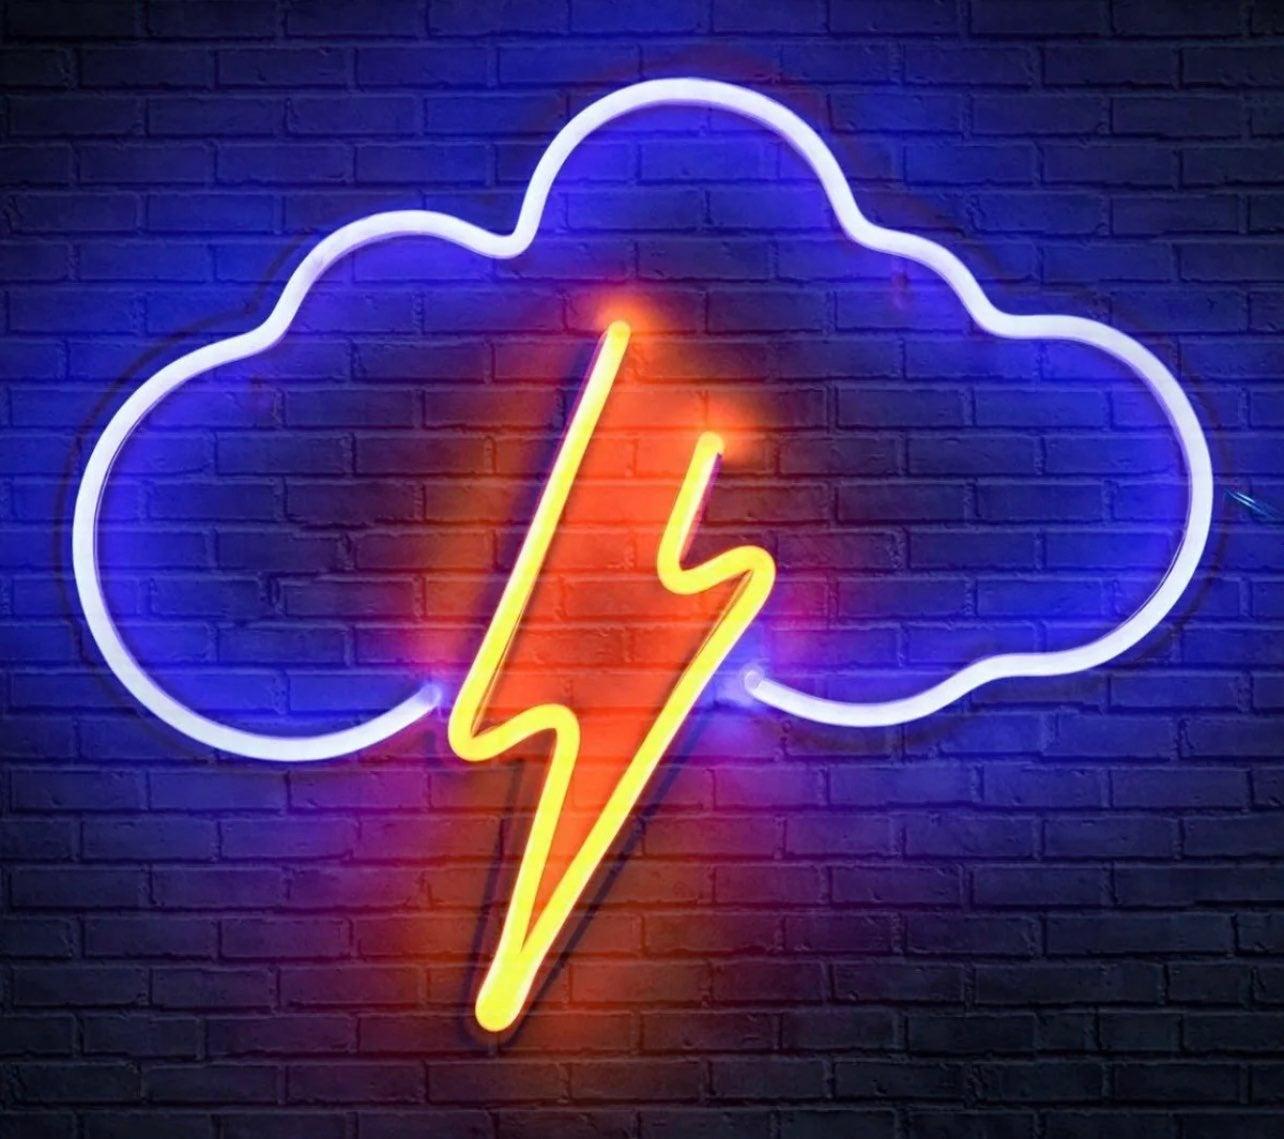 Thunder Storm Neon Sign Decor